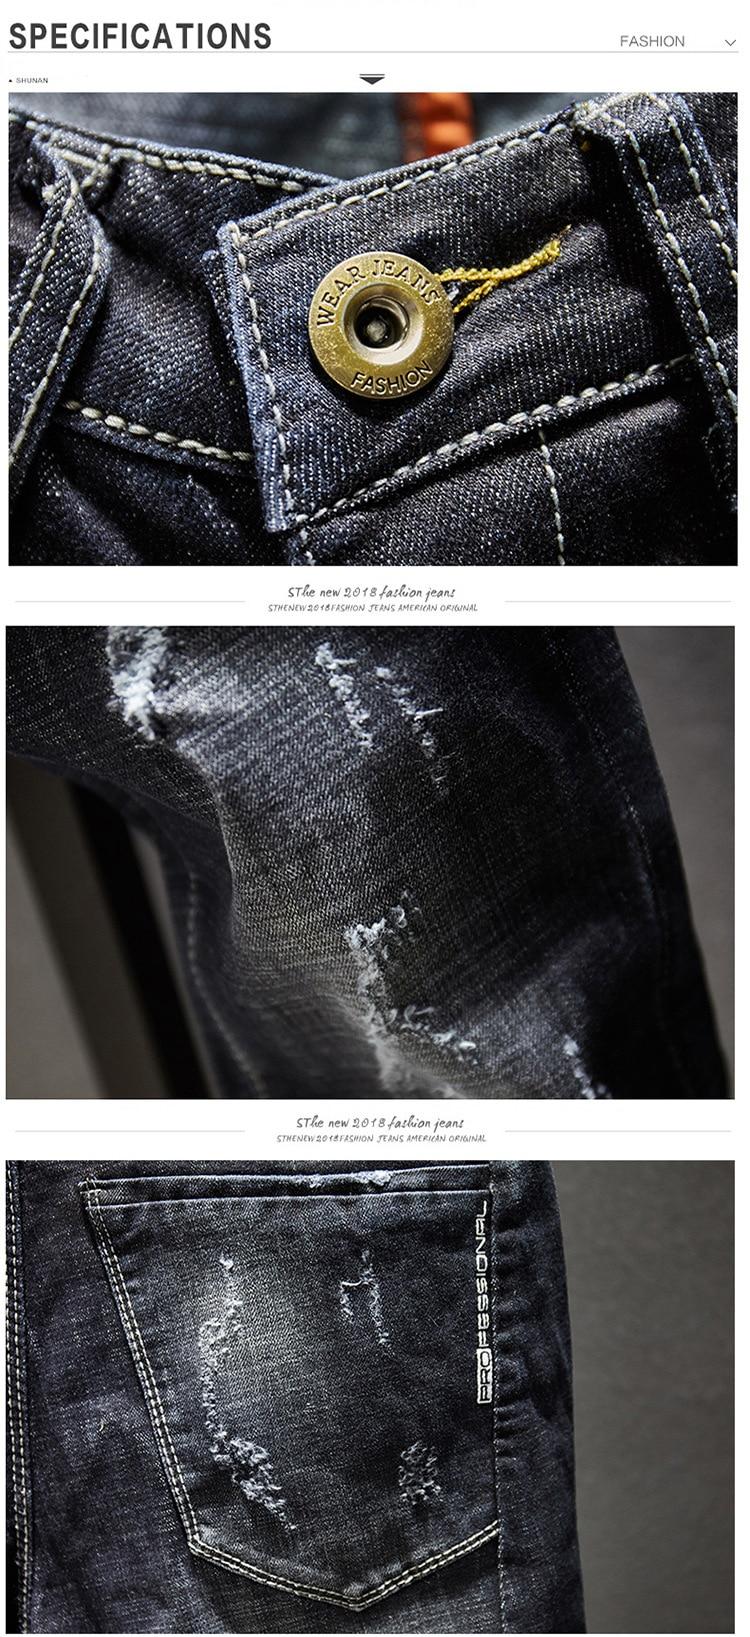 KSTUN Ripped Jeans Men Dark Blue Stretch Slim Fit Distressed Streetwear Denim Pants Casual Retro